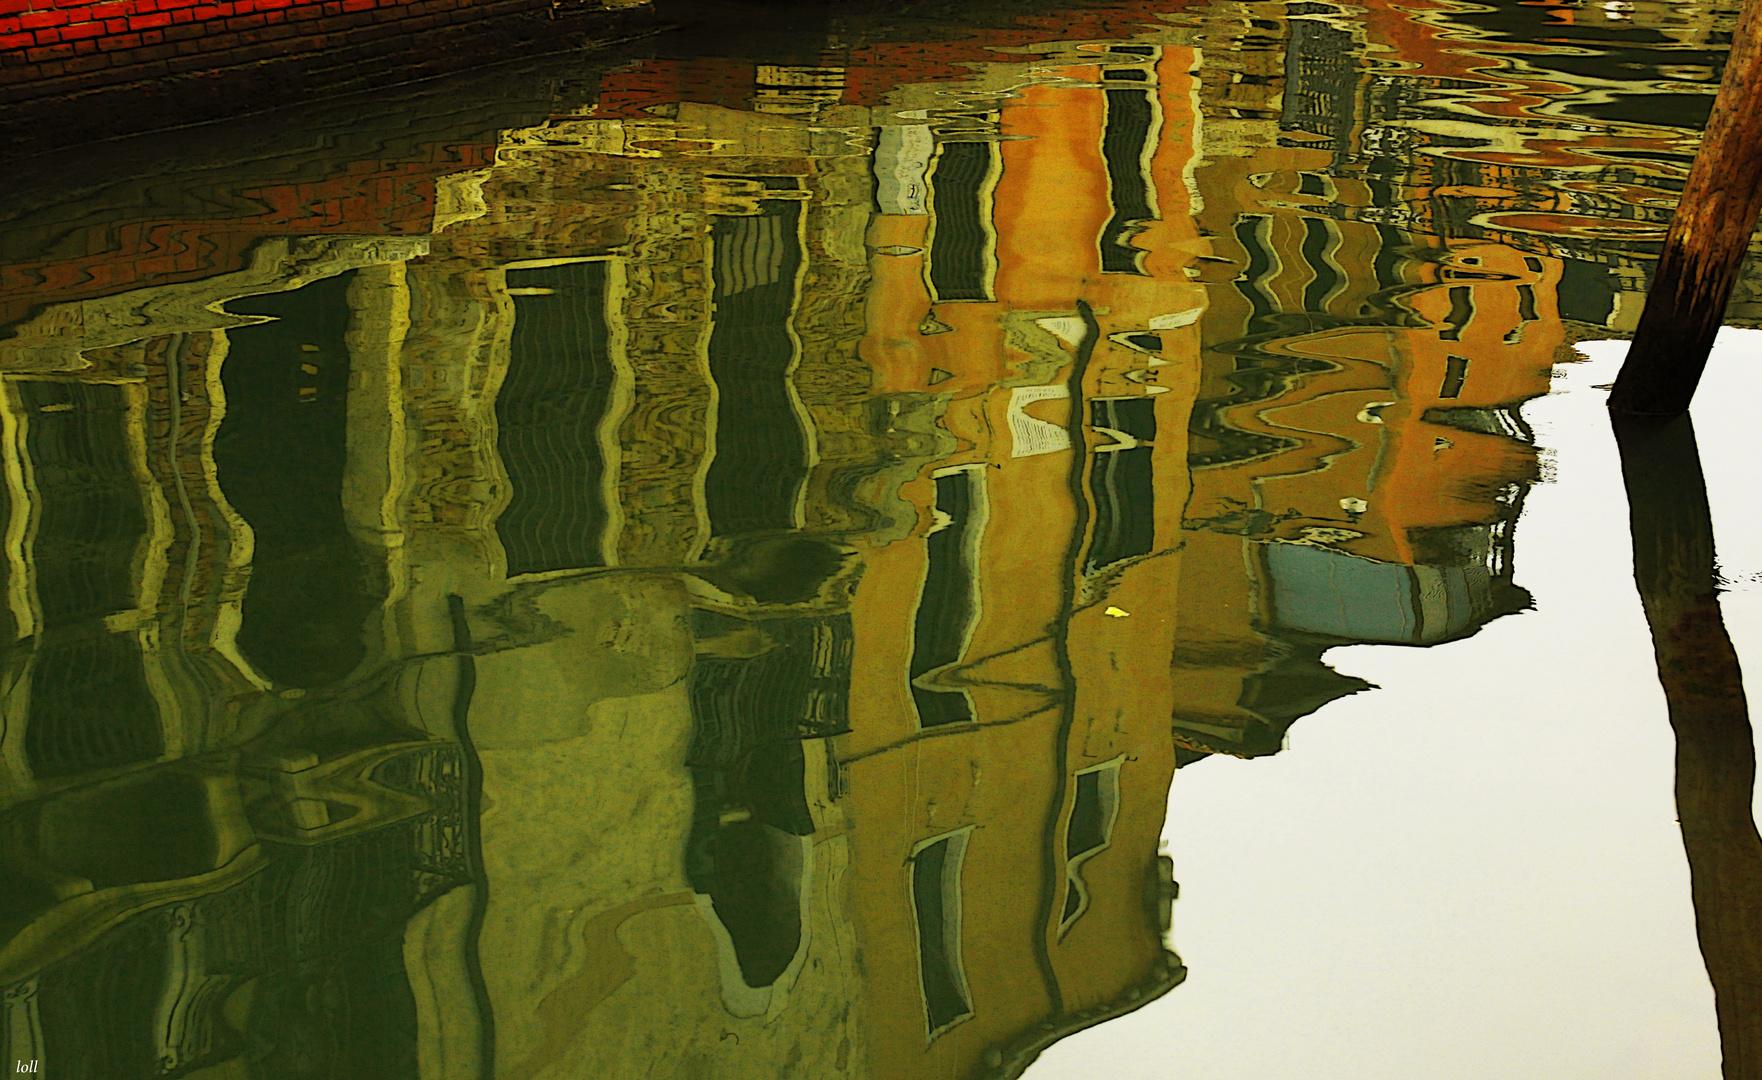 ...reflejos venezianos...